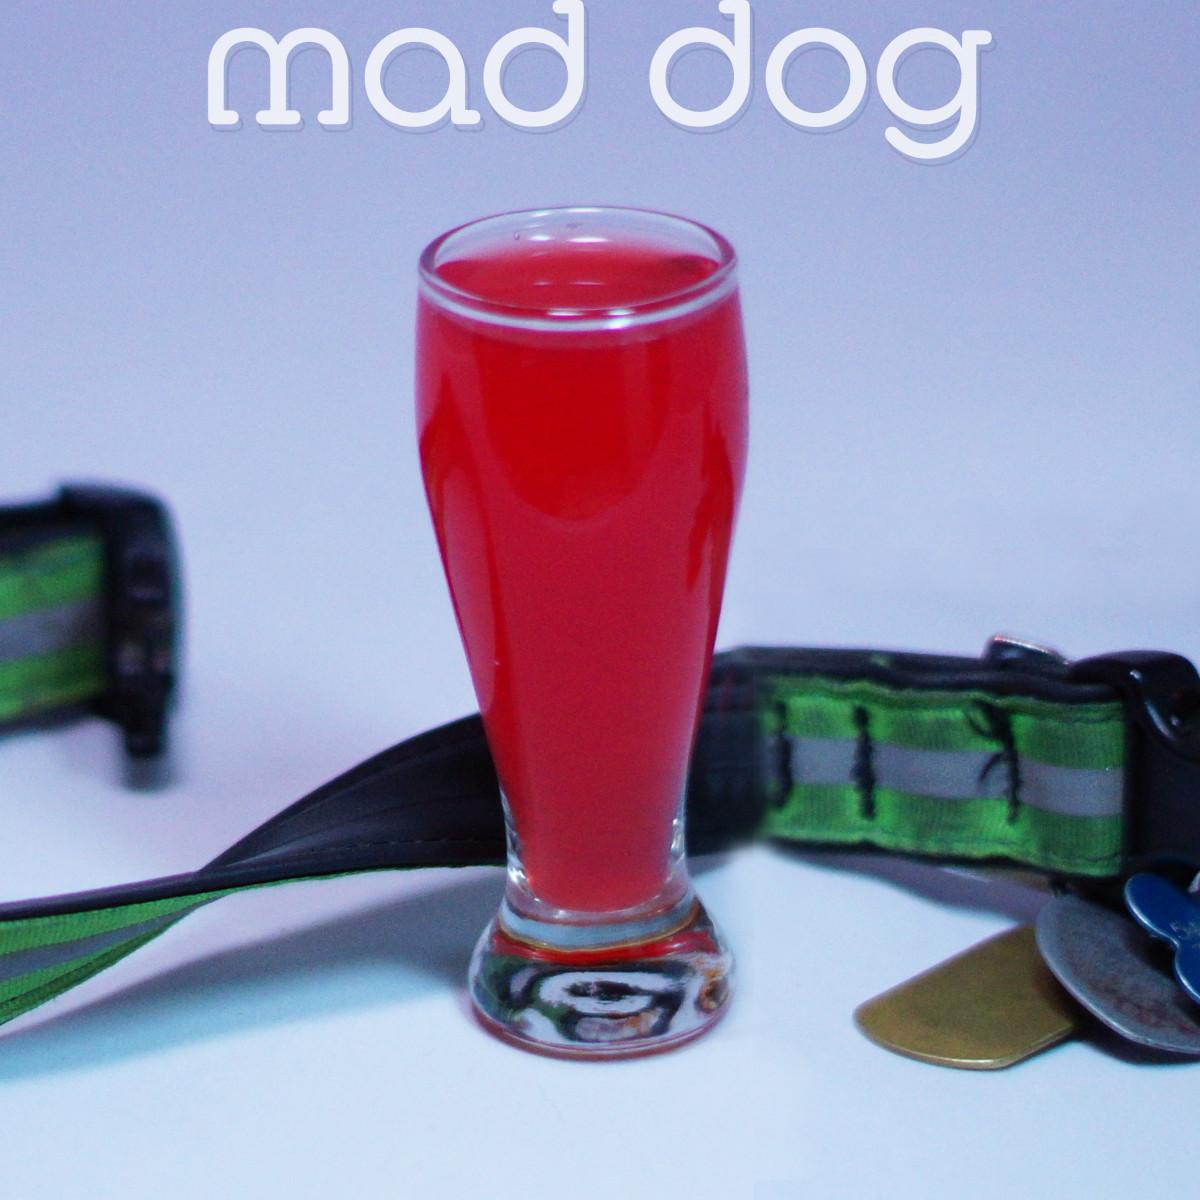 Mad Dog